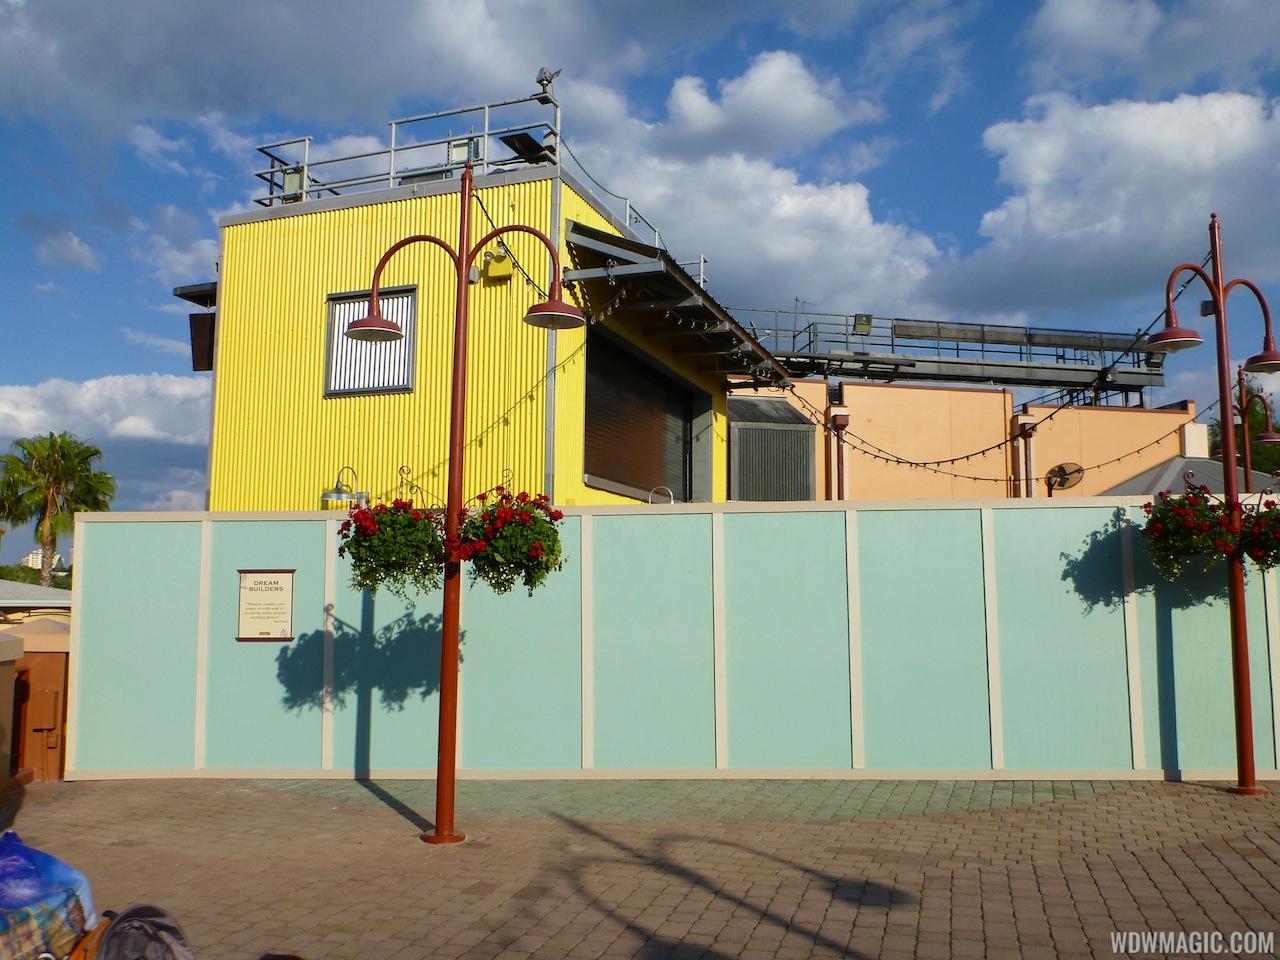 Construction walls up in former Pleasure Island area